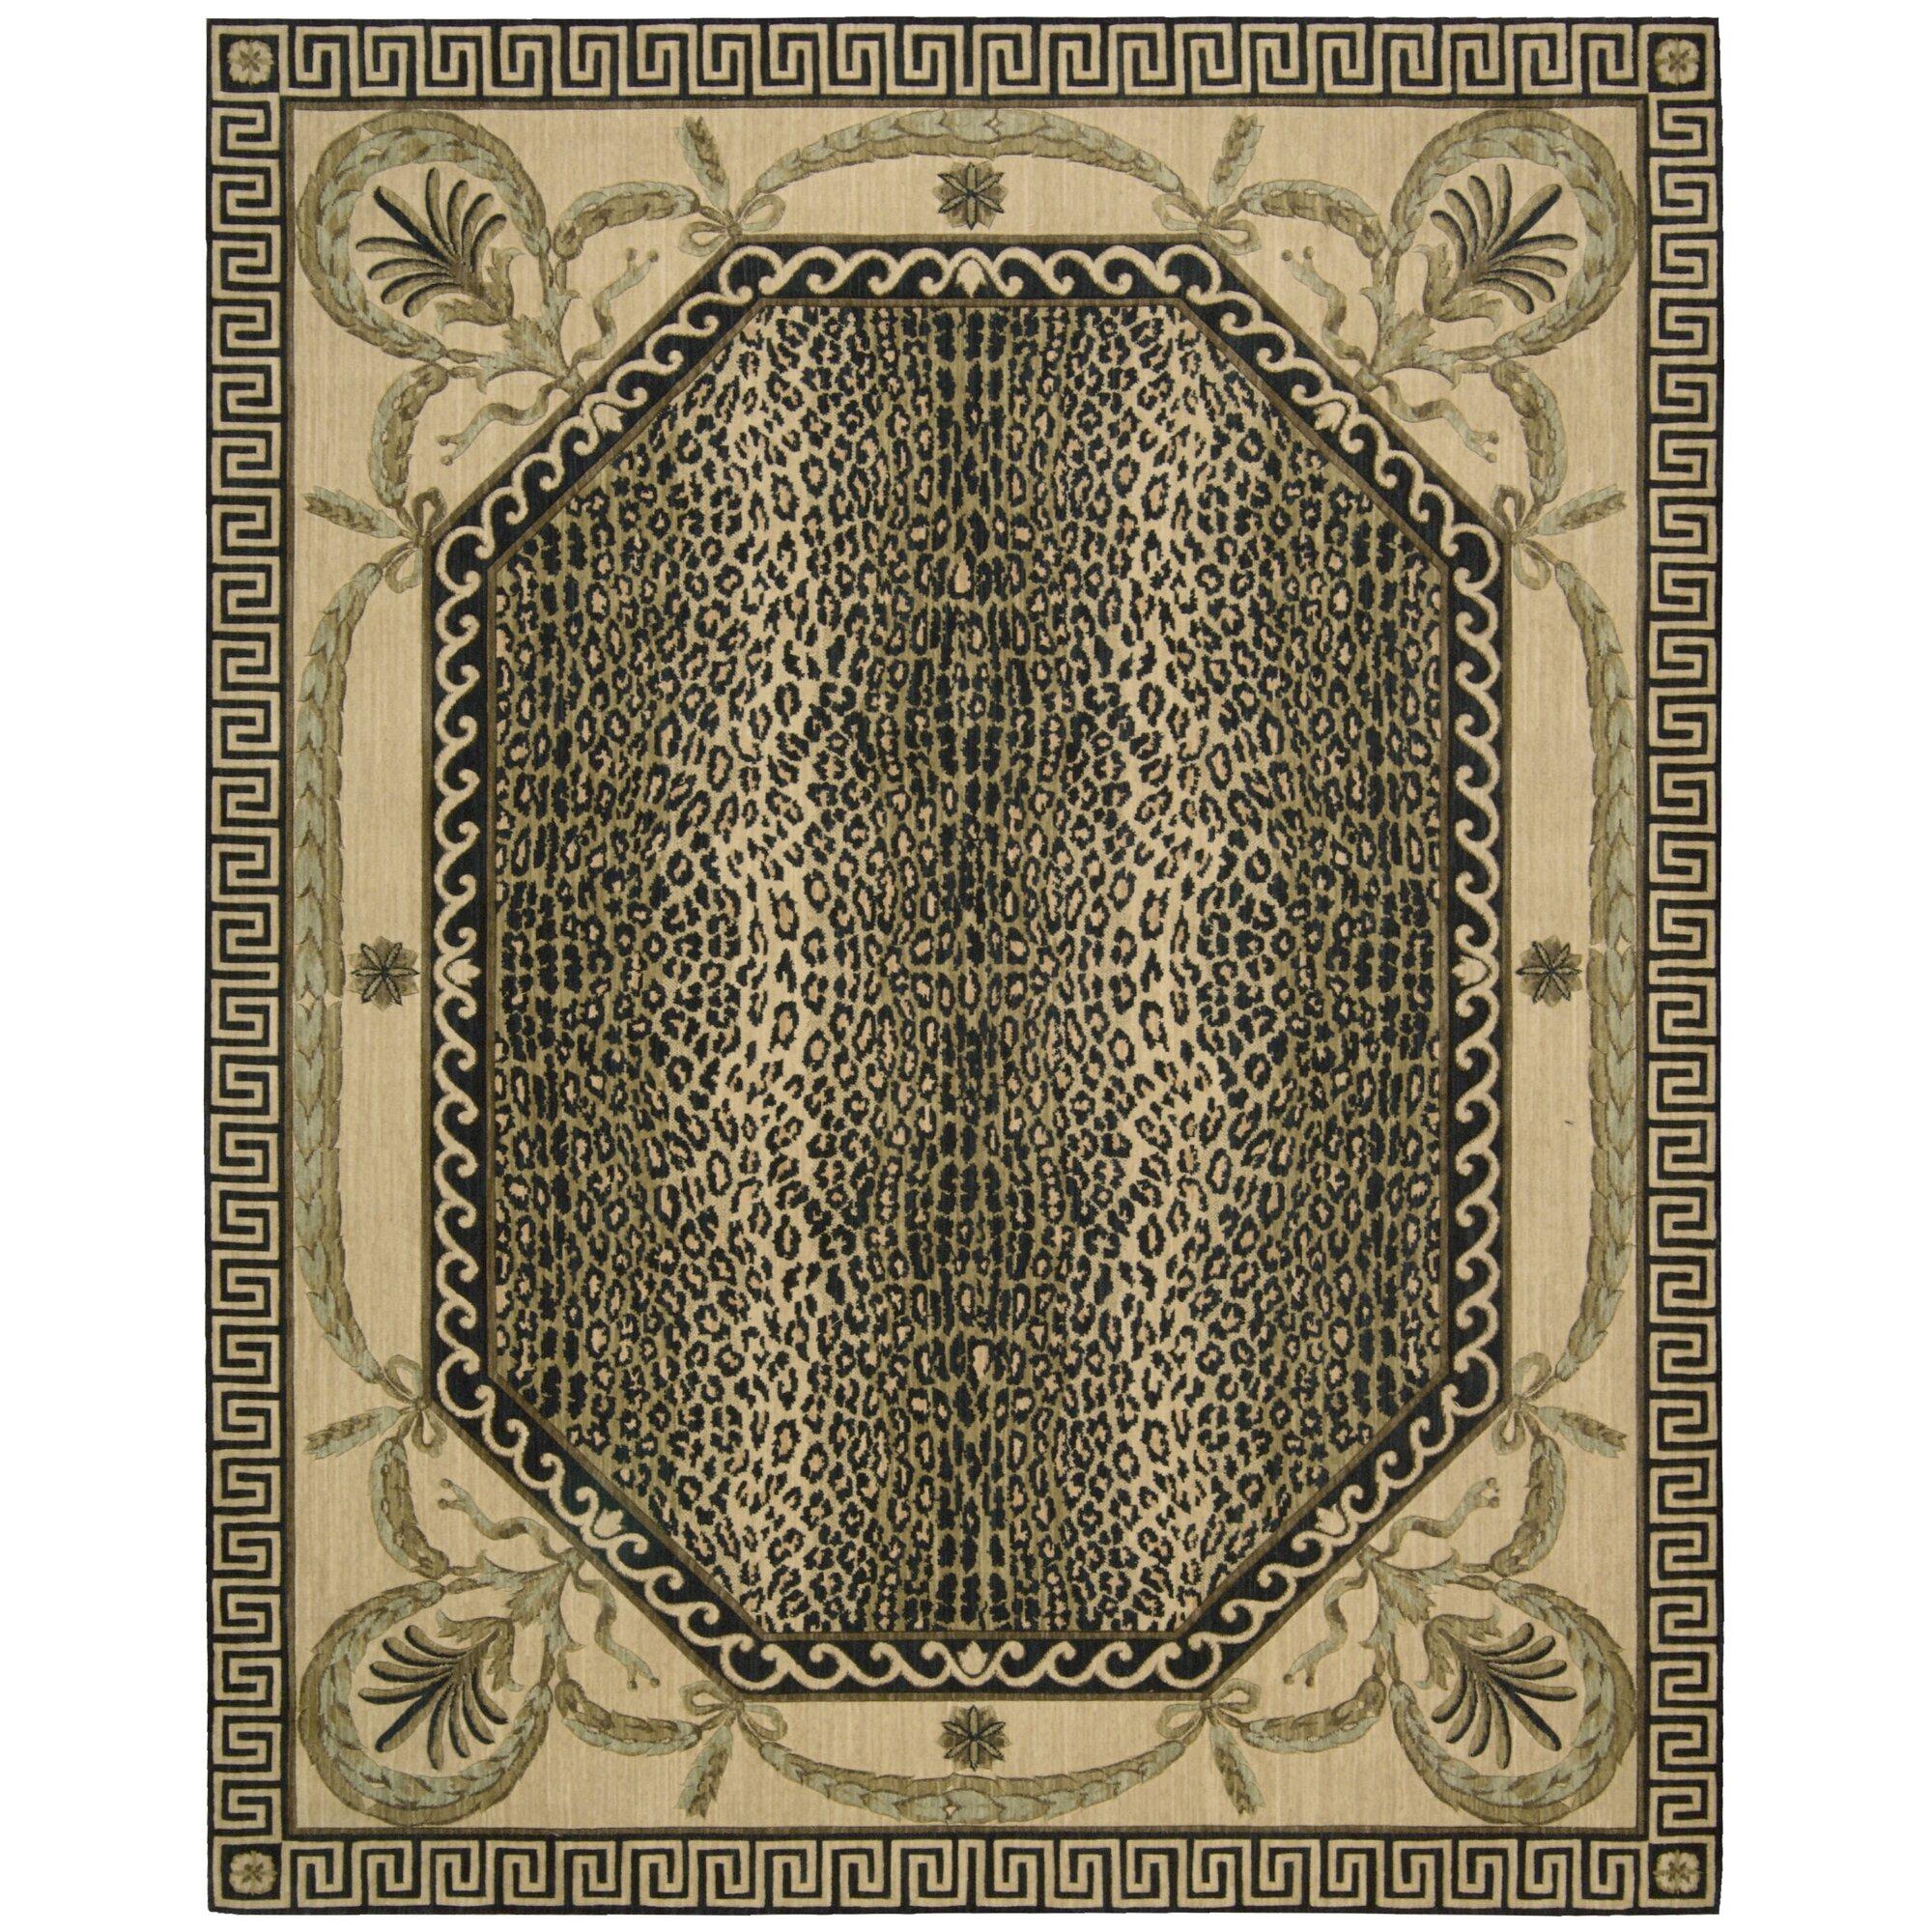 Leopard Print Rug In Dining Room: Nourison Vallencierre Multi Animal Print Area Rug